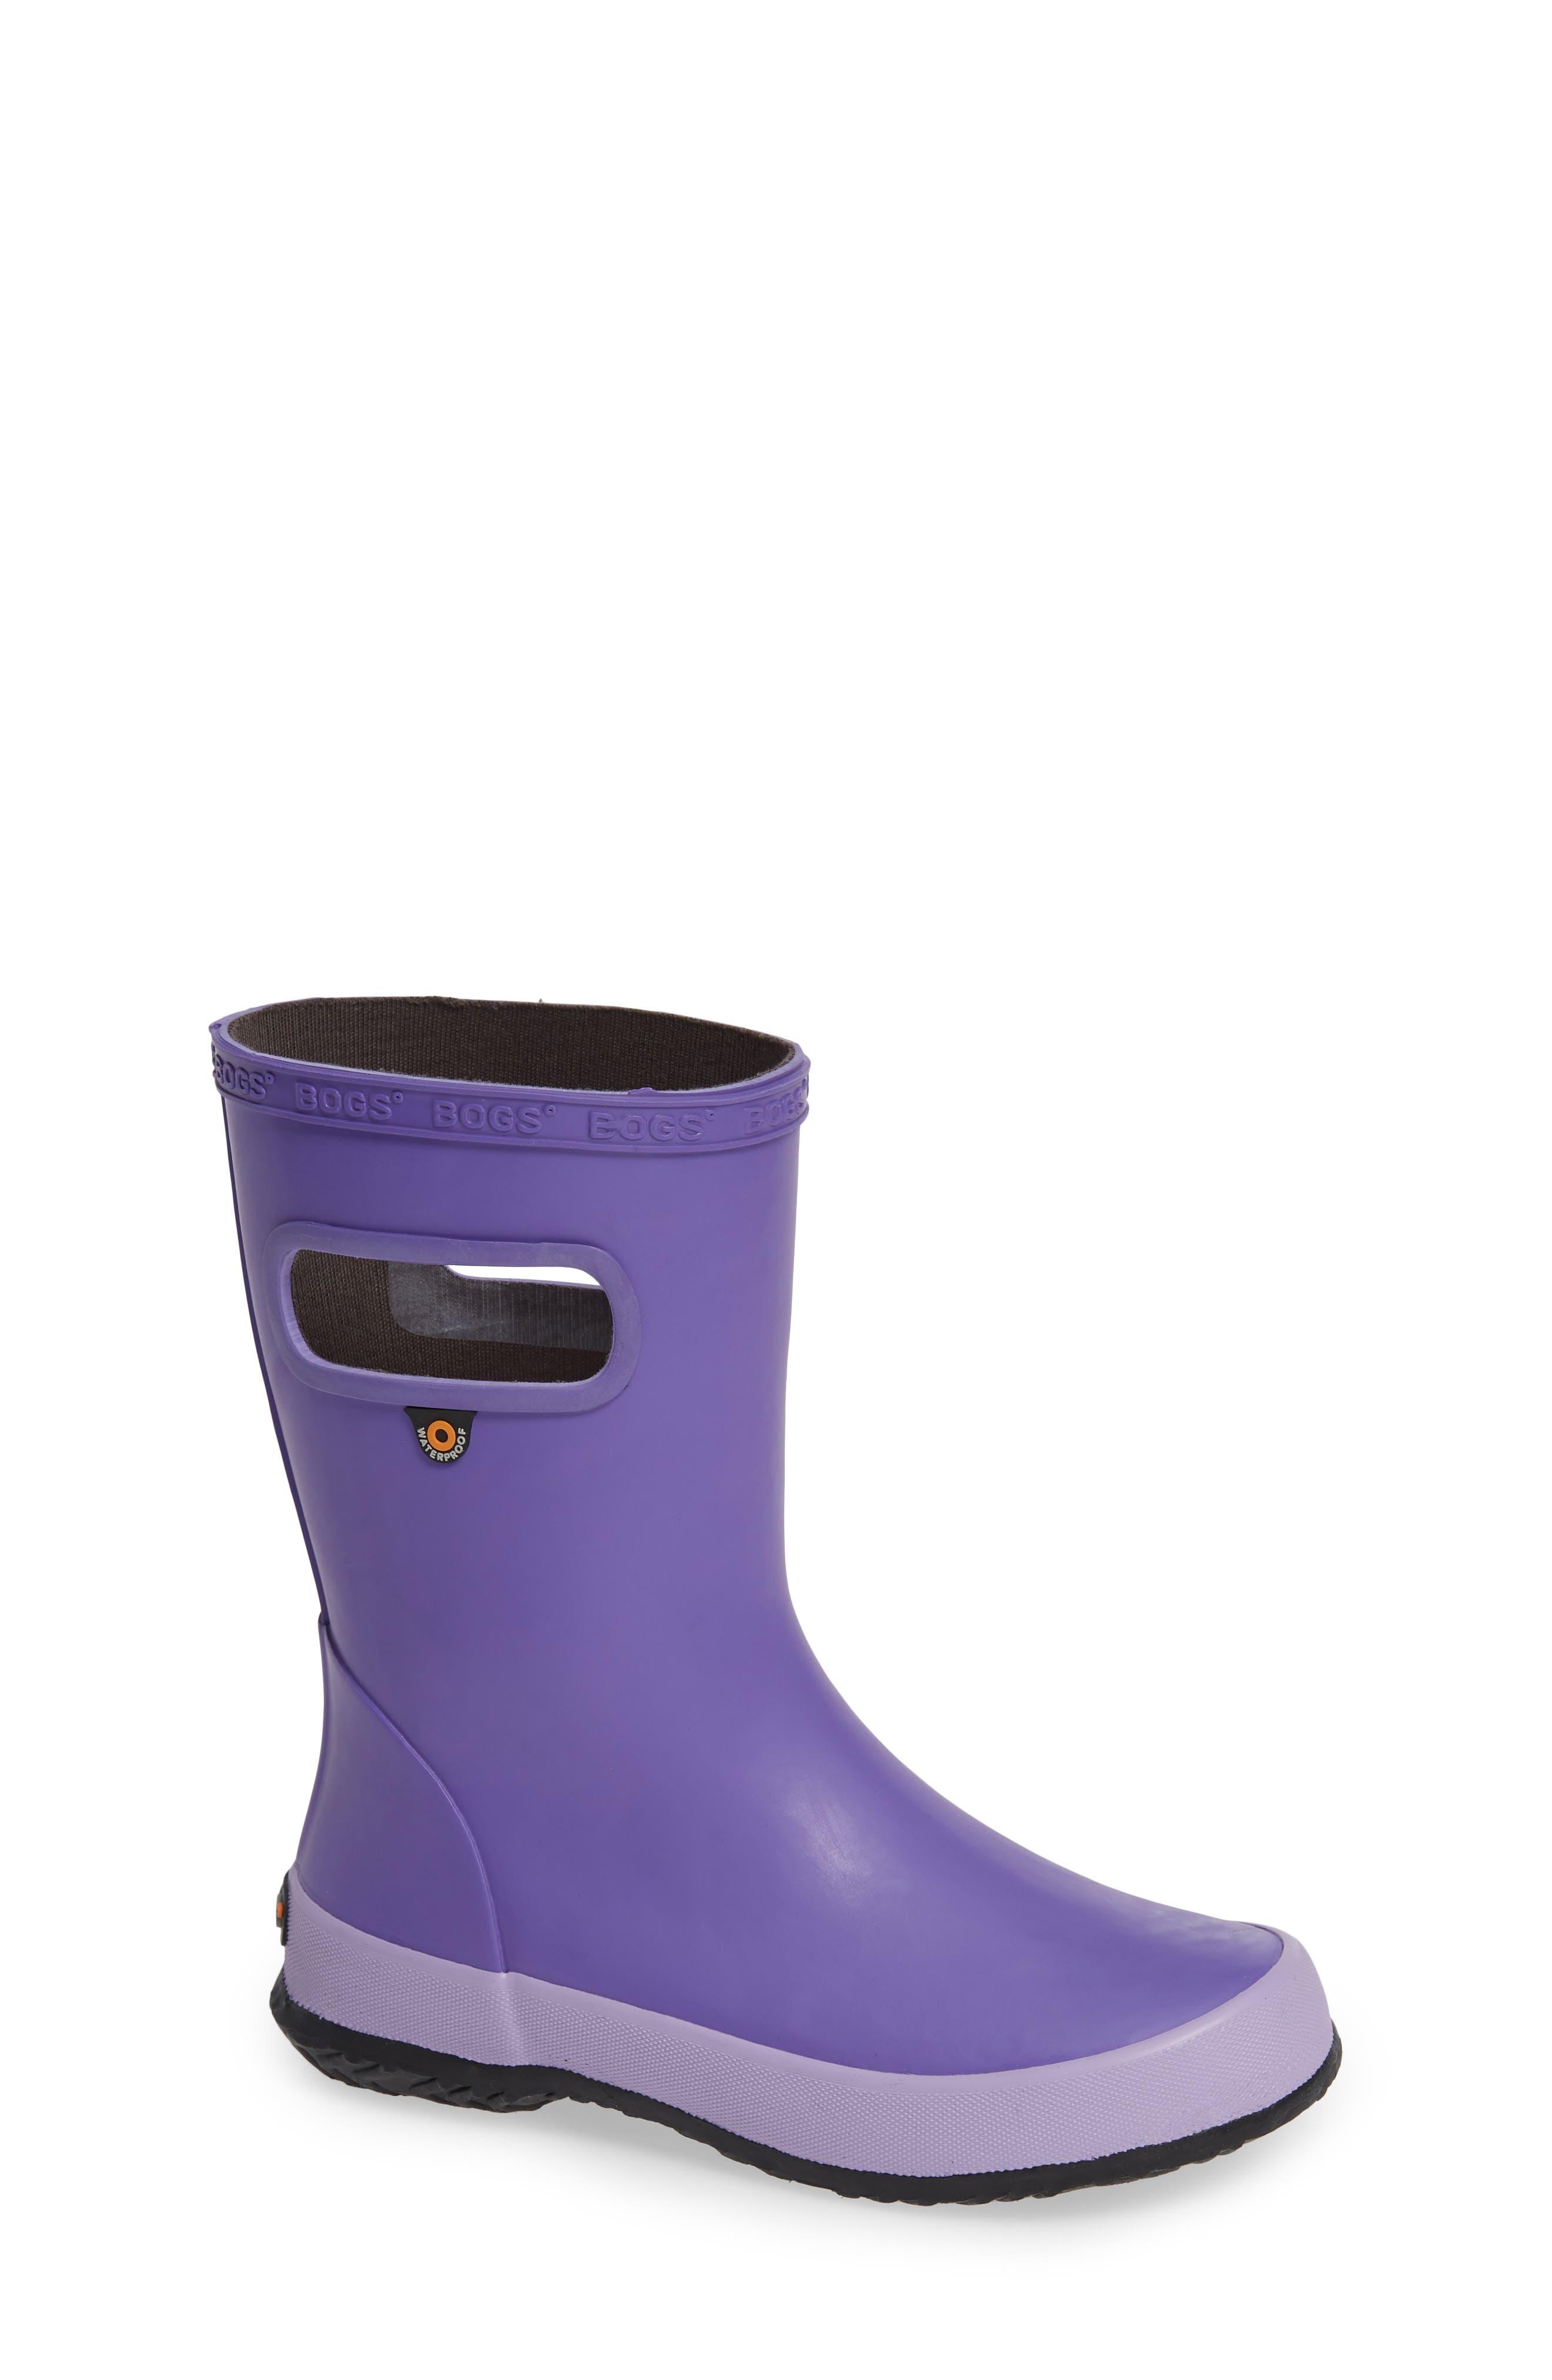 BOGS Skipper Solid Rubber Waterproof Rain Boot, Main, color, 531